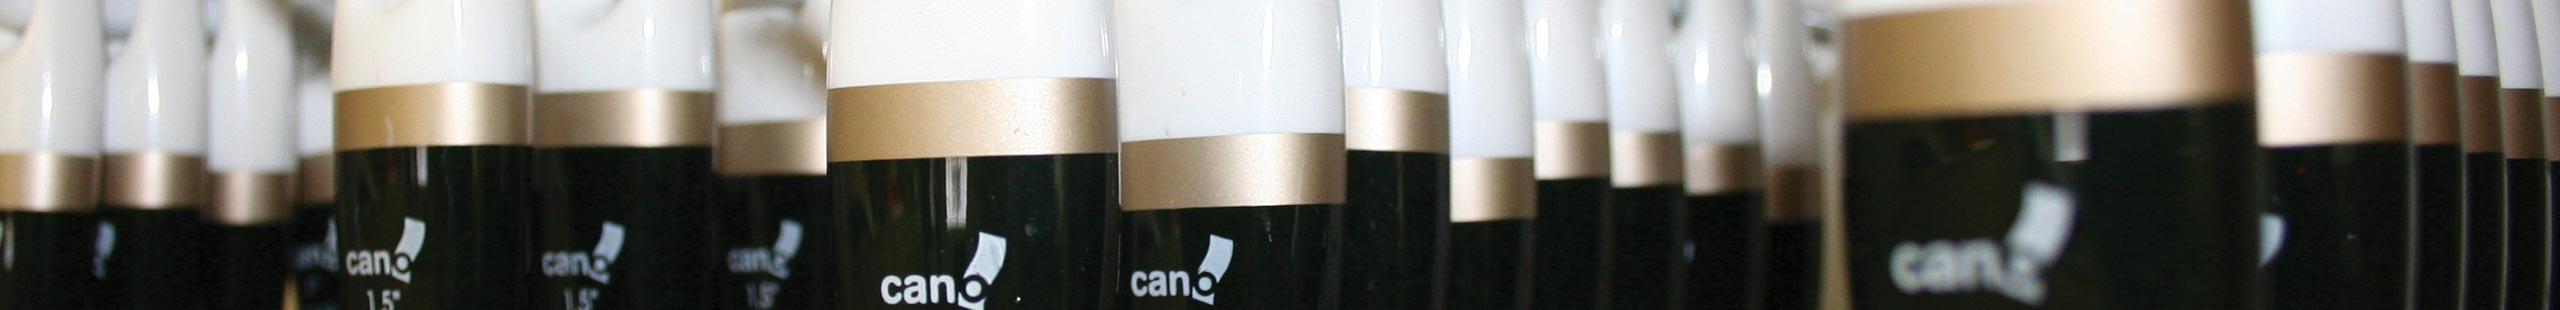 cano-sa